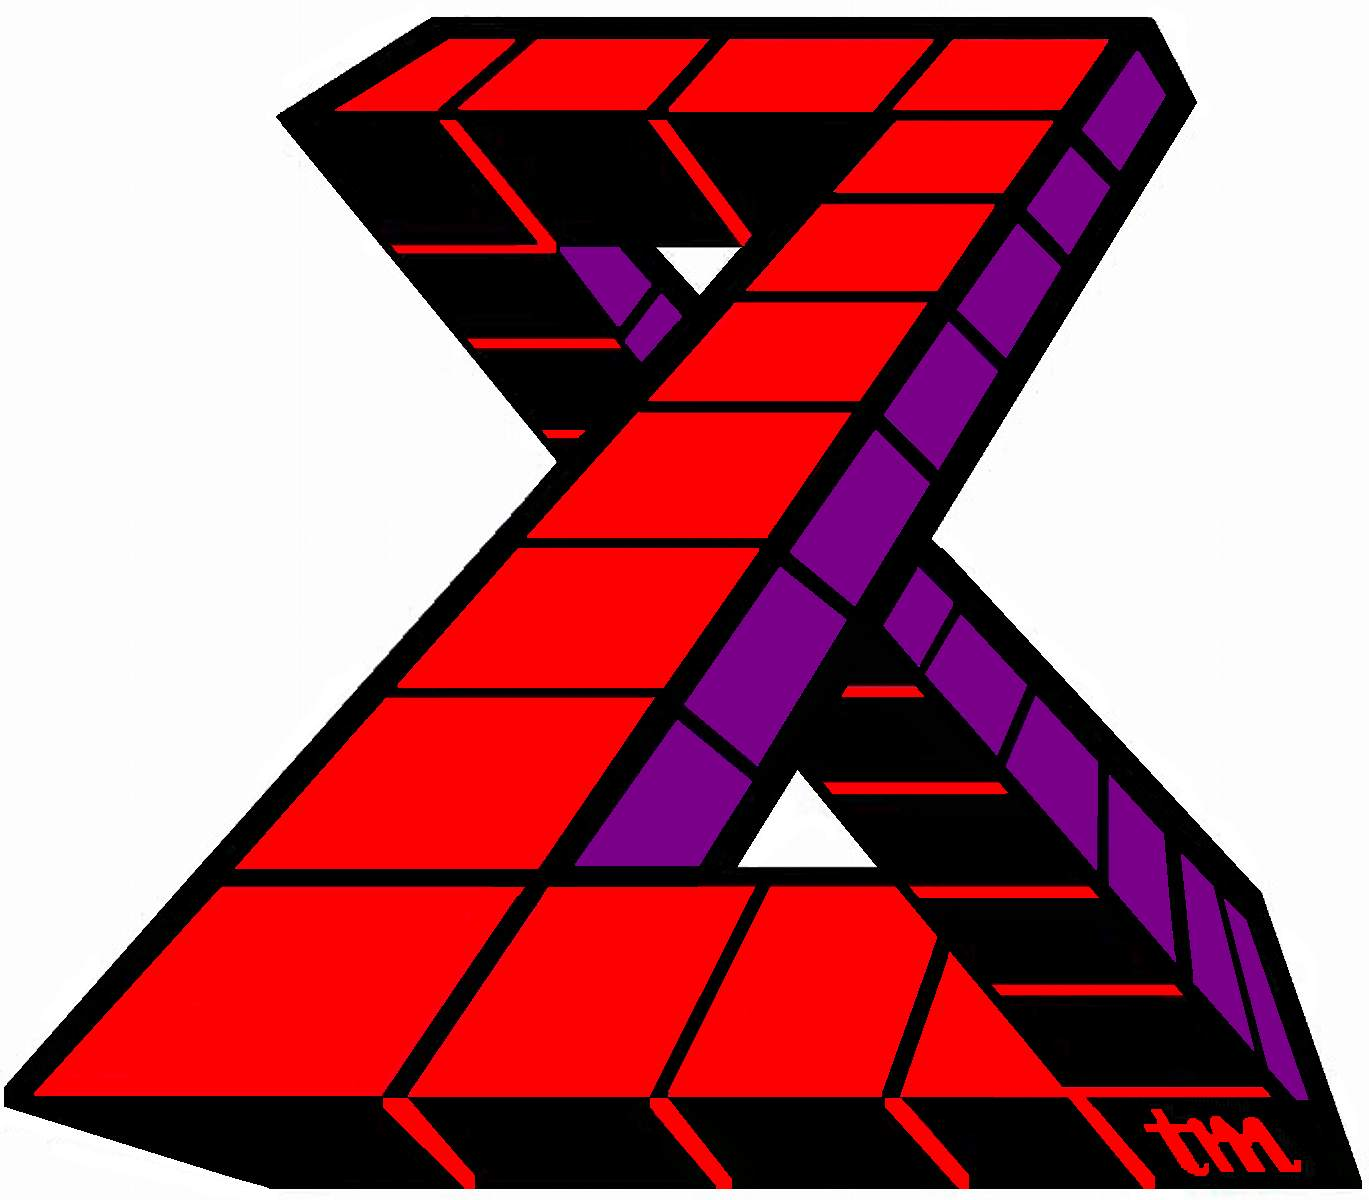 Our Zigfinity logo says it all Zigzag